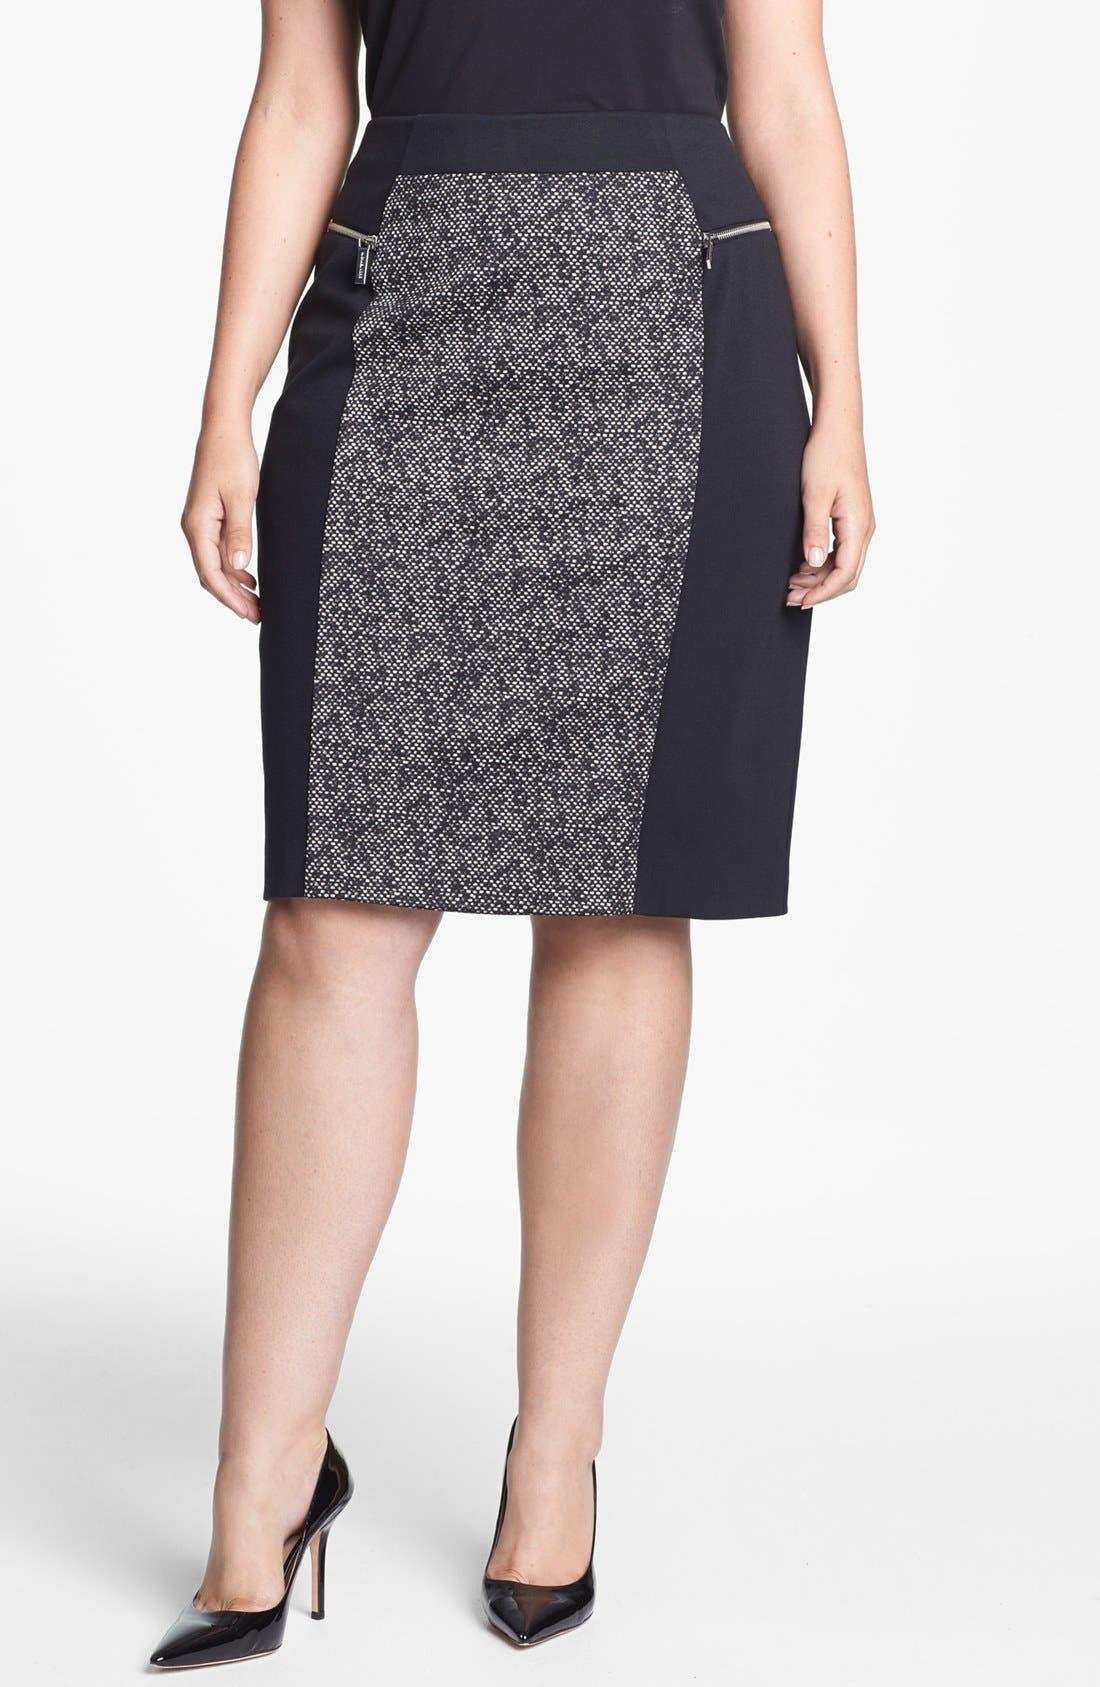 Alternate Image 1 Selected - MICHAEL Michael Kors Colorblock Ponte Pencil Skirt (Plus Size)